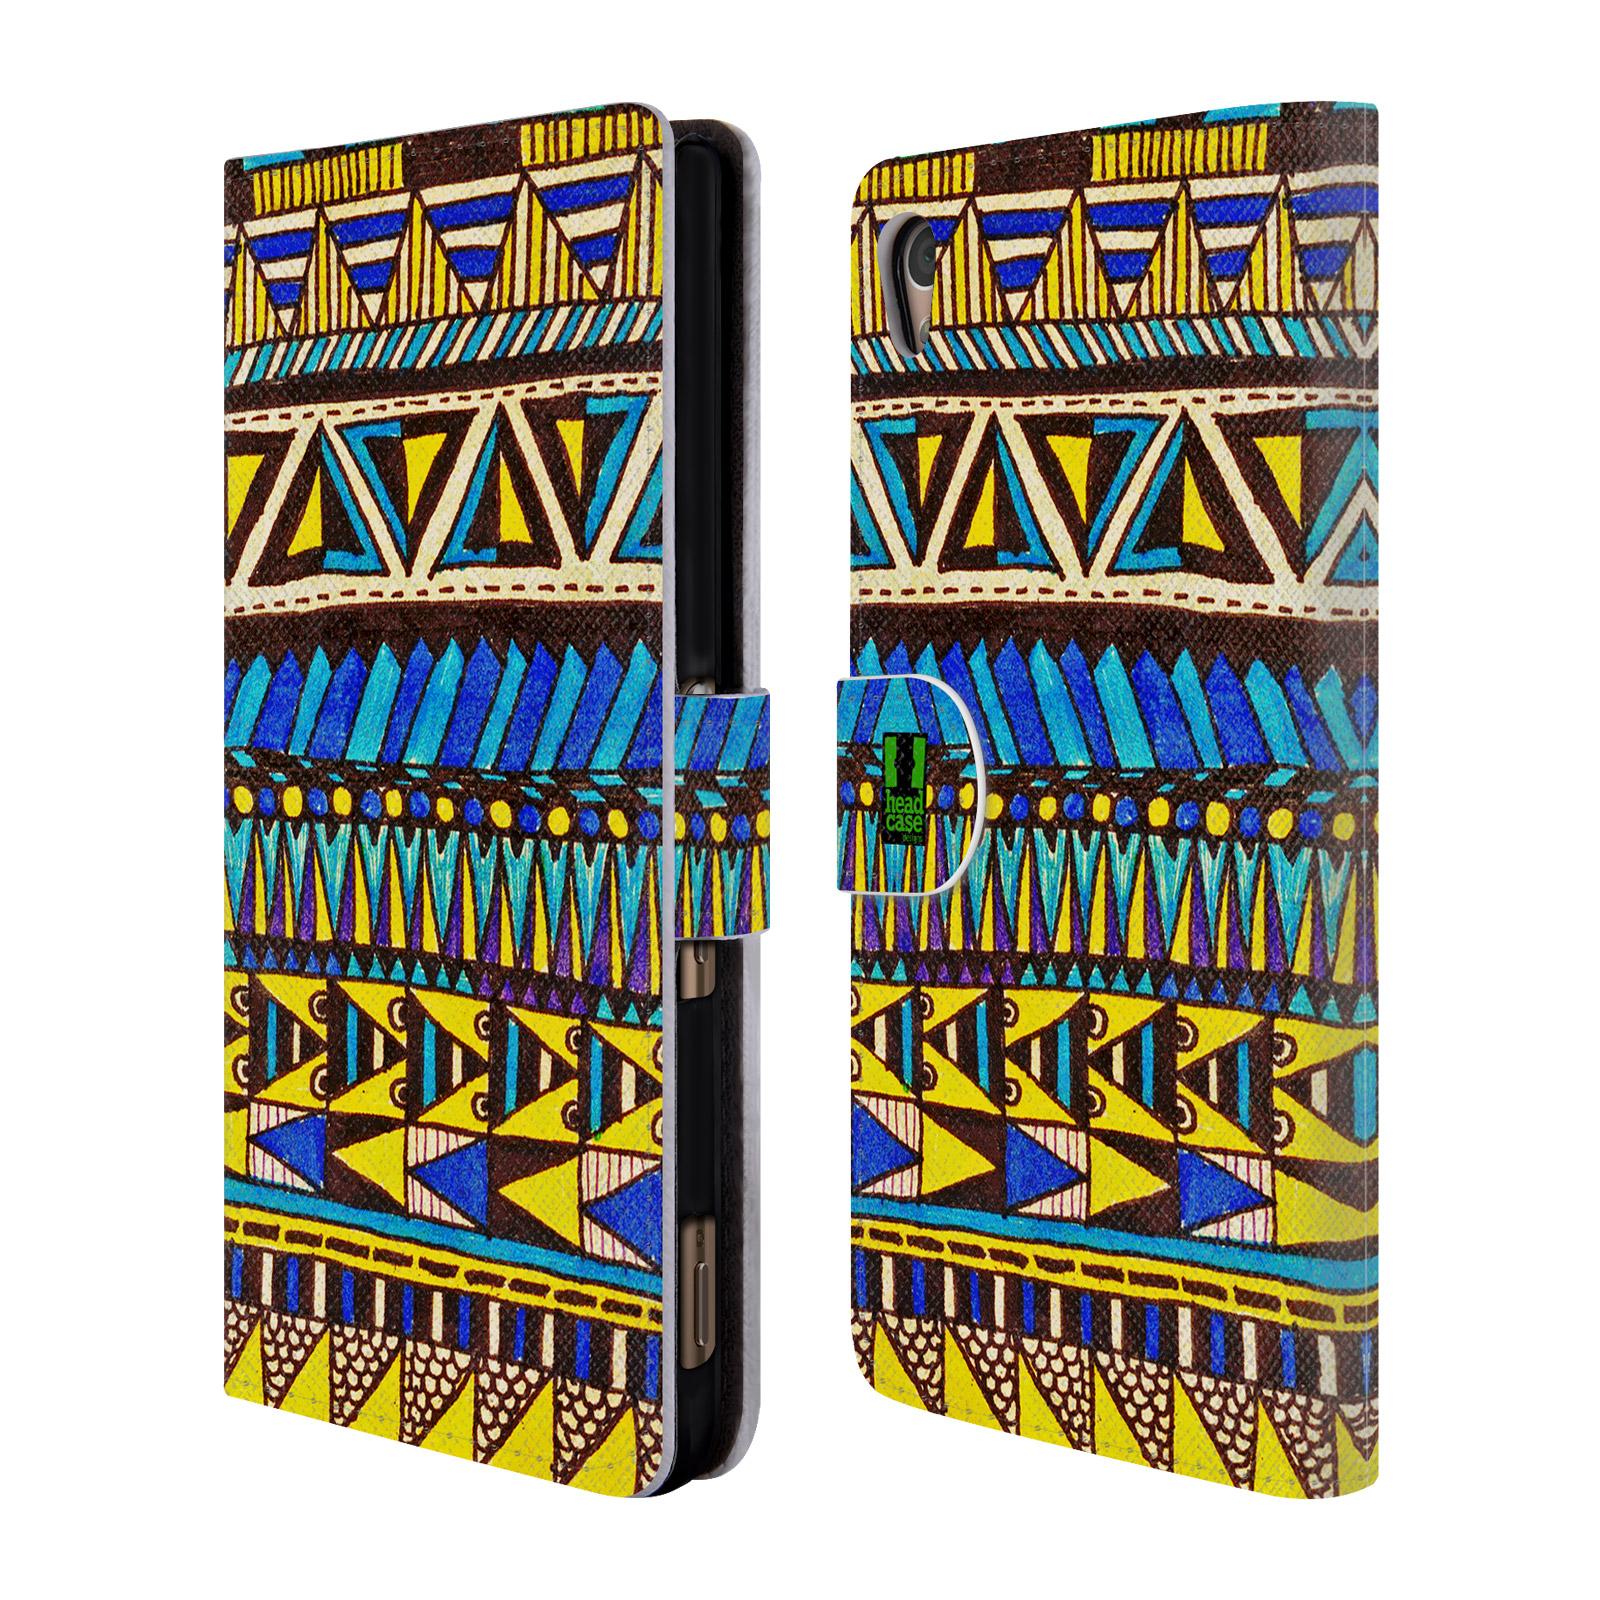 HEAD CASE Flipové pouzdro pro mobil SONY XPERIA Z3+ (PLUS) Barevná aztécká čmáranice modrá